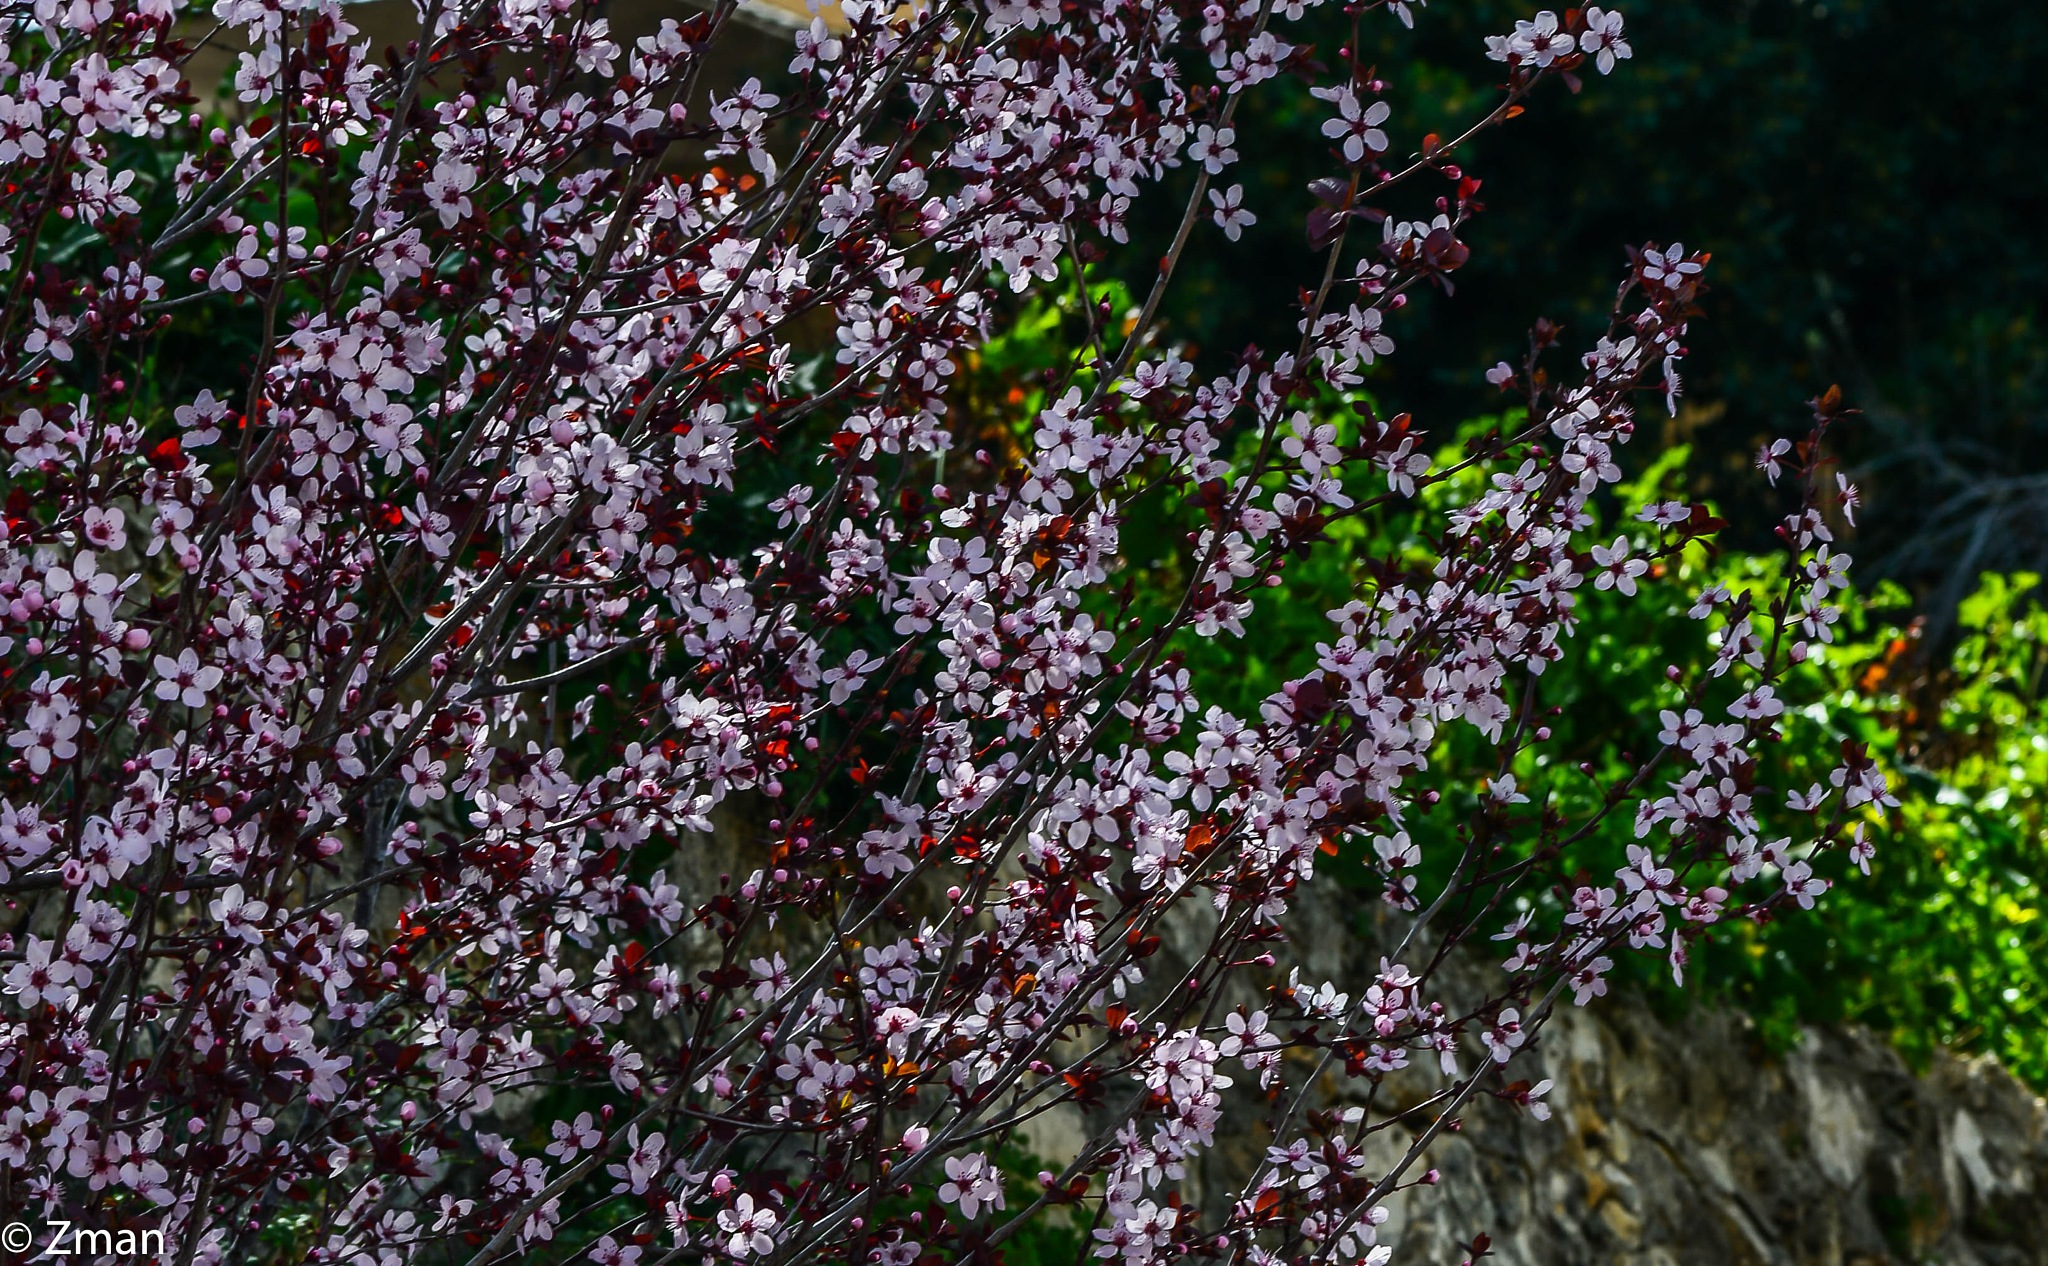 Pink Flowers are Plenty by muhammad.nasser.963